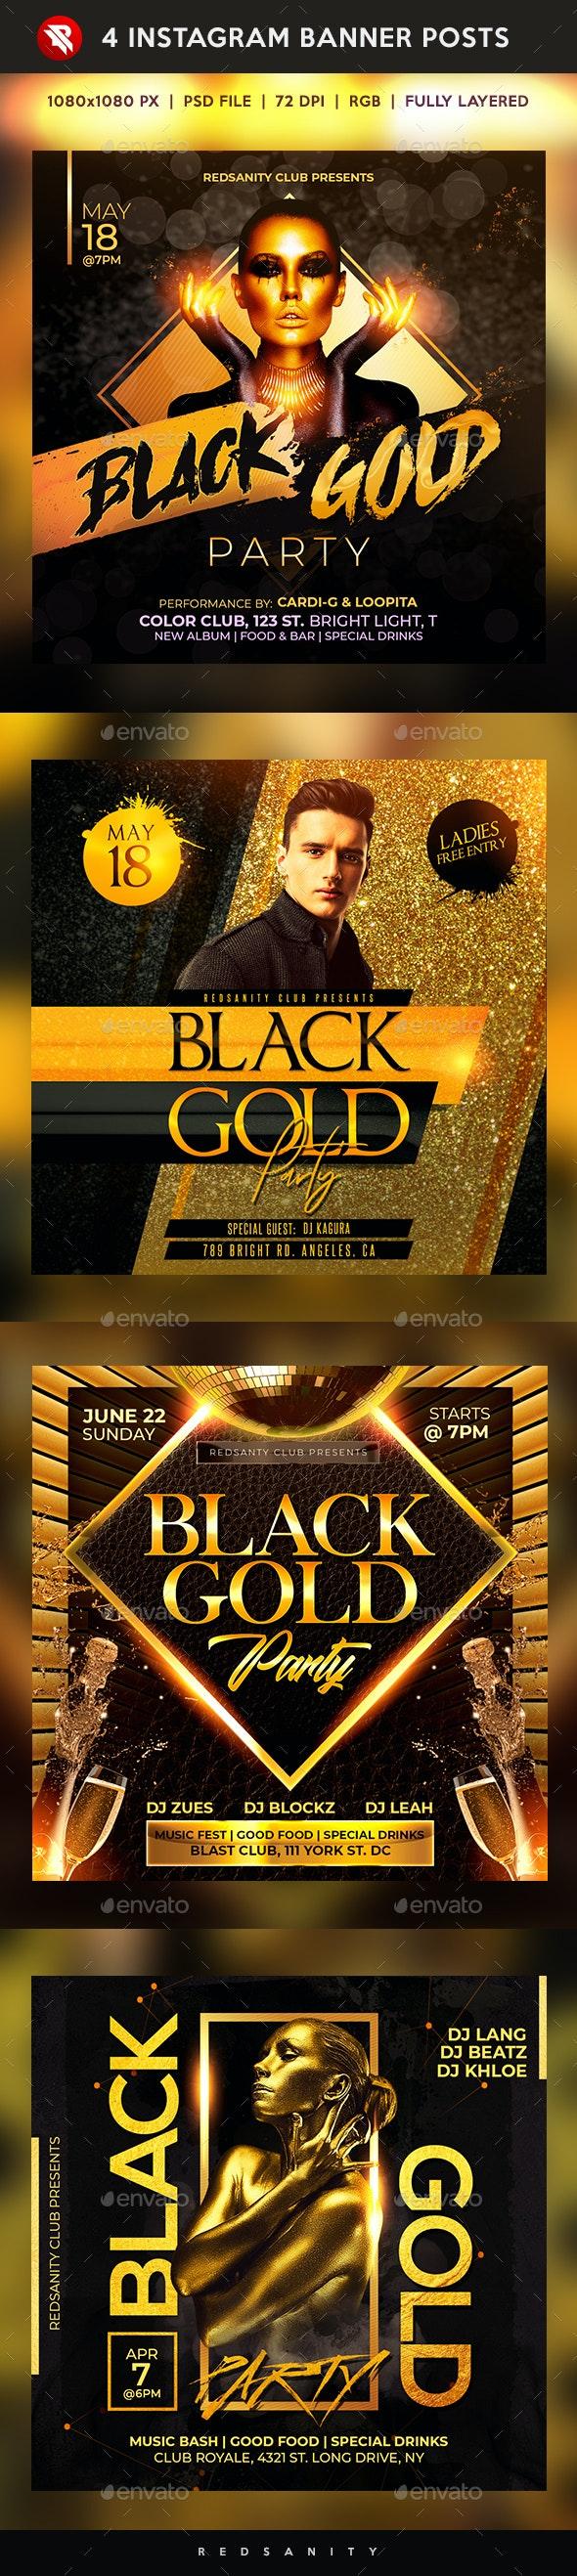 Black Gold Party Instagram Banner Posts - Social Media Web Elements